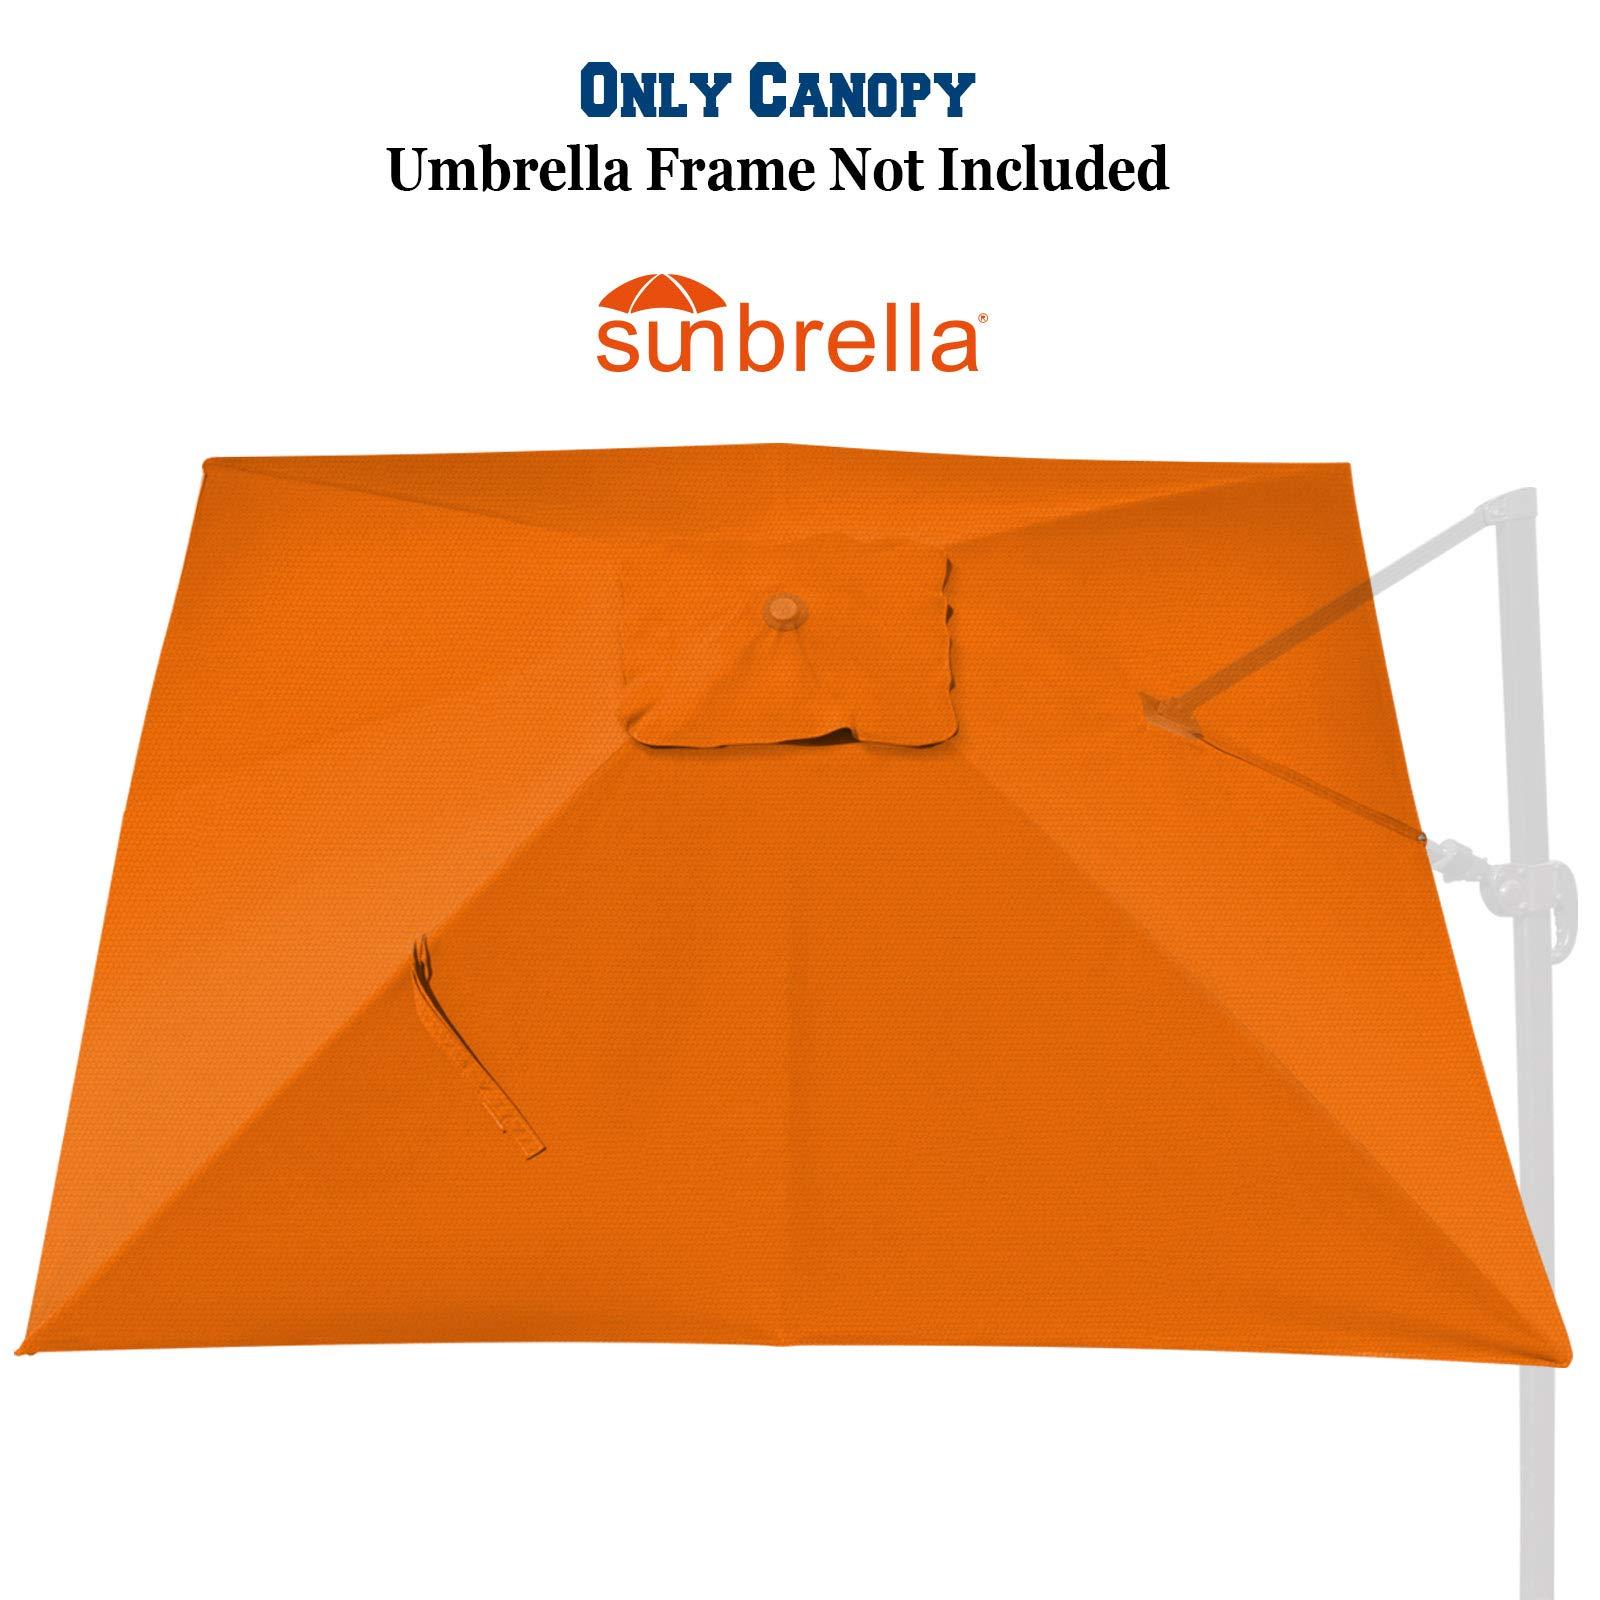 BenefitUSA Outdoor Replacement Canopy Cover for 10x10ft 8 Ribs Rome Cantilever Patio Umbrella Parasol Top Sunbrella Cover (Tuscan)